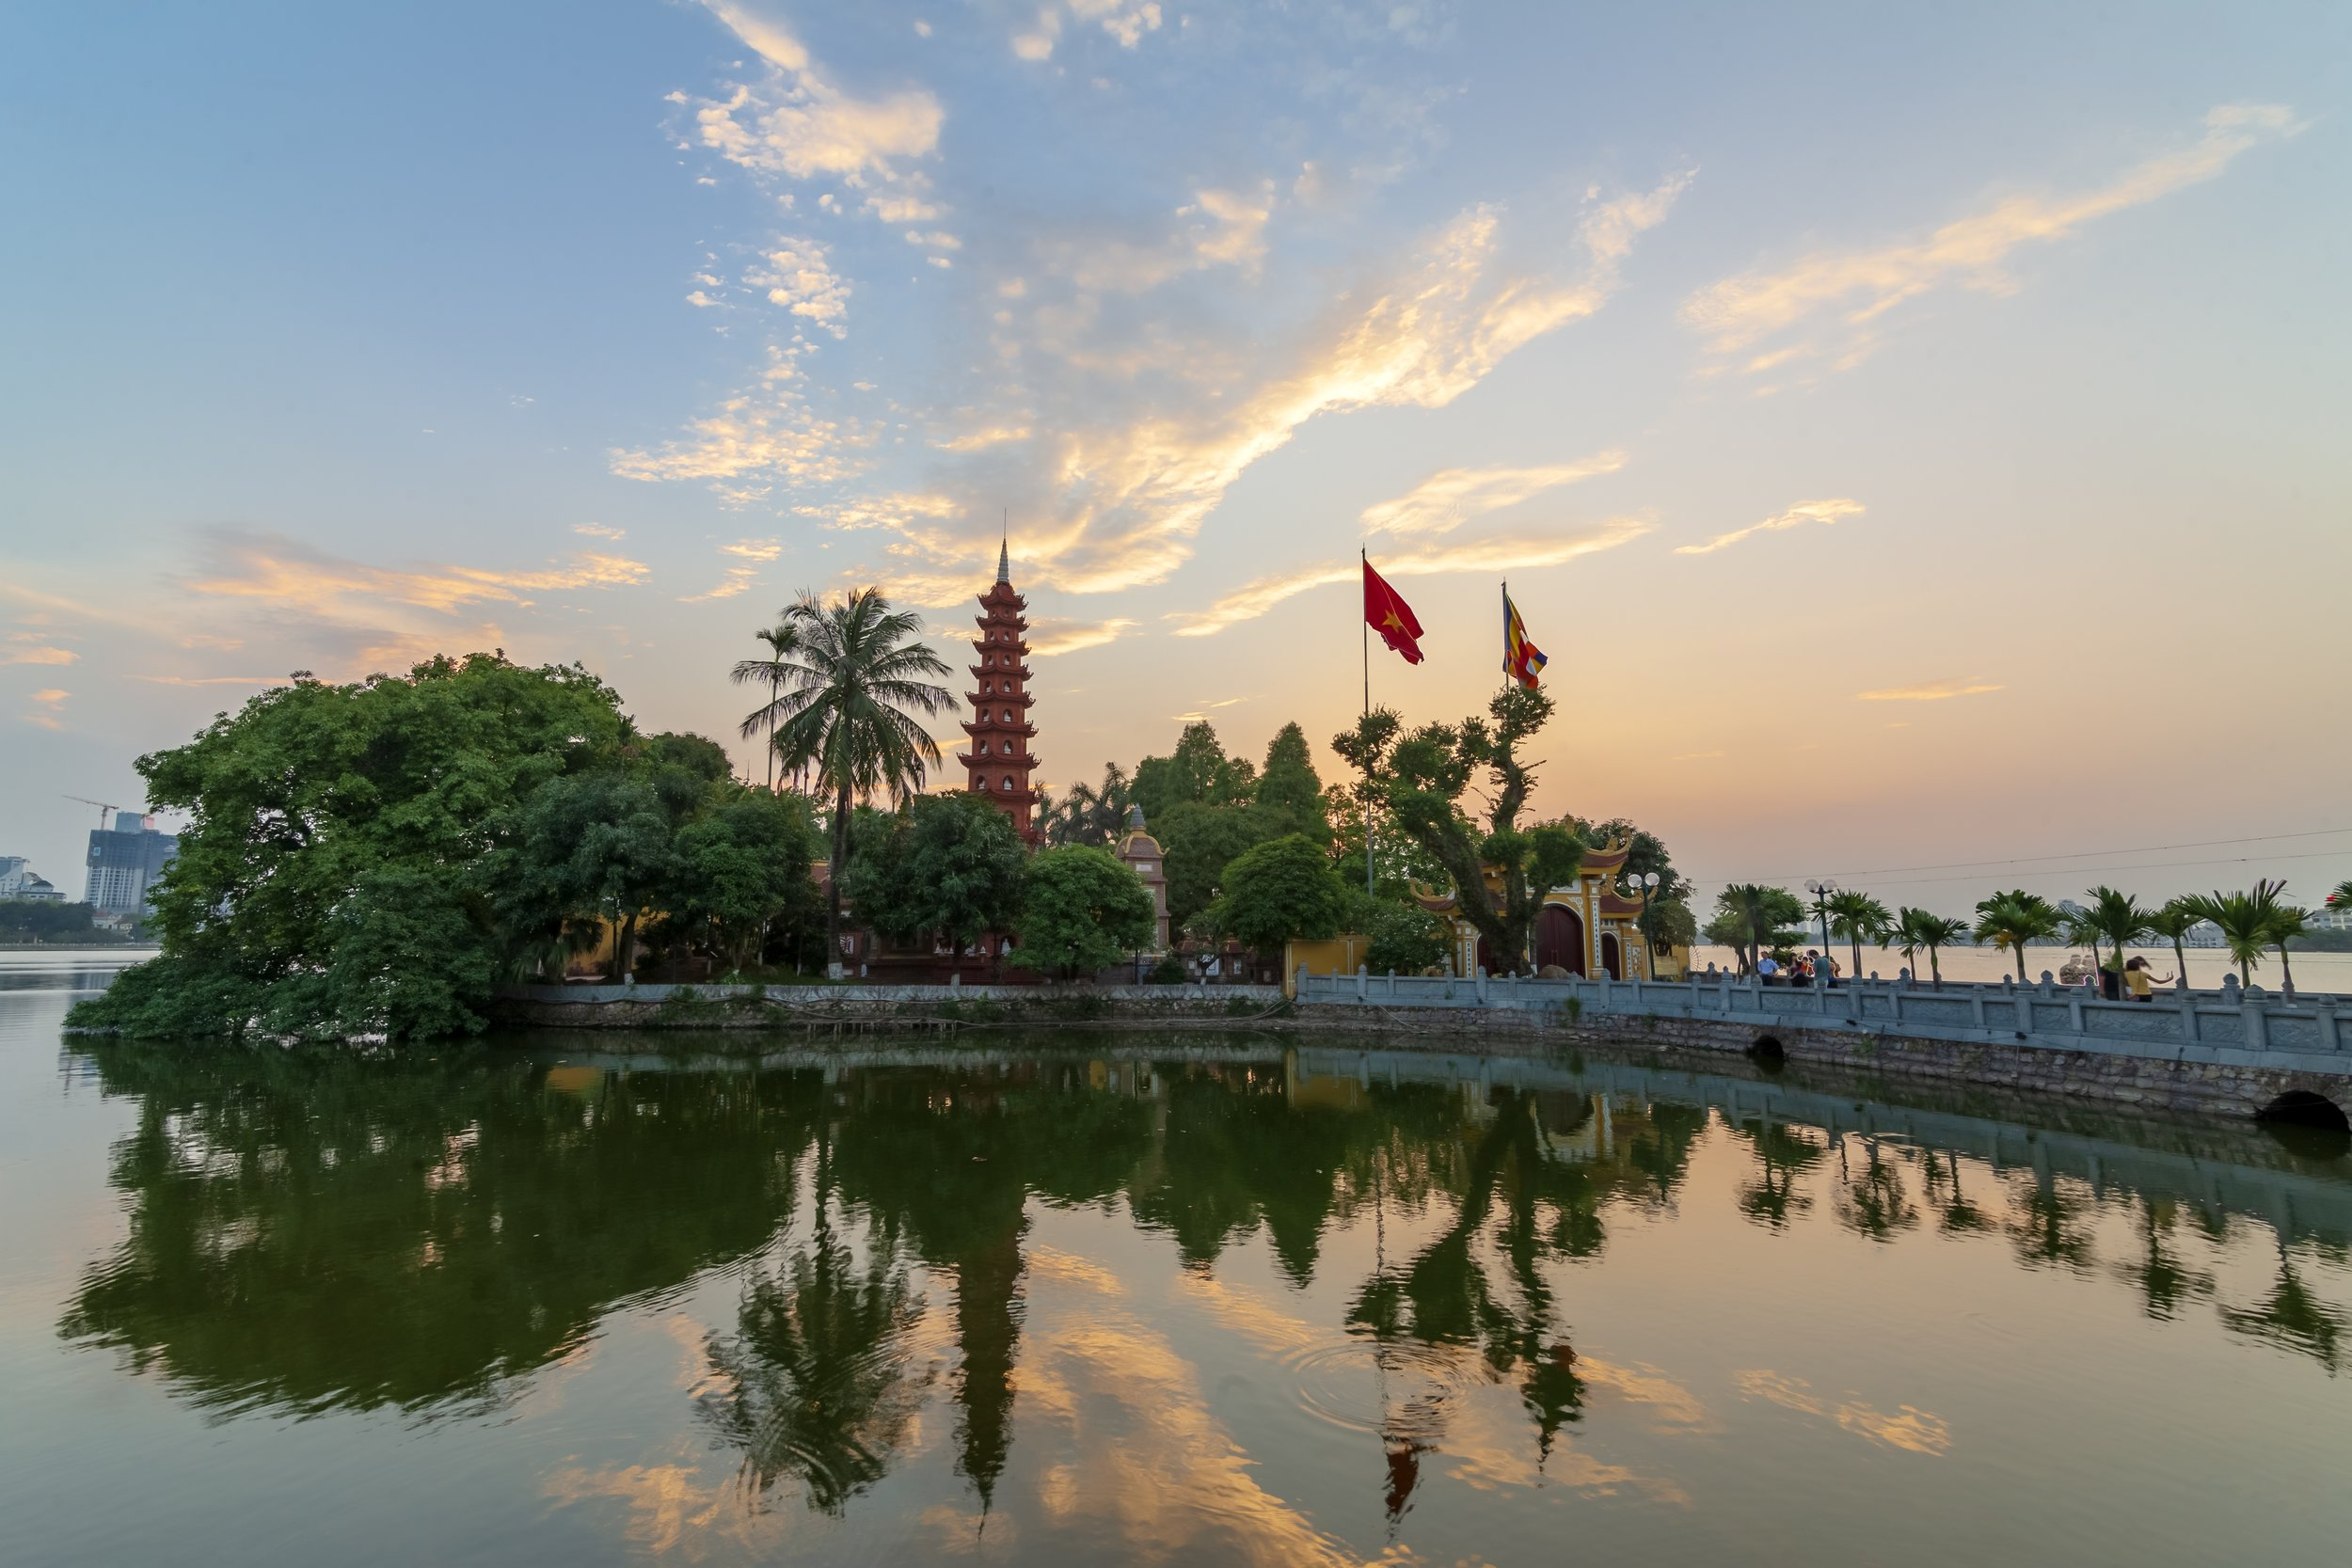 tran-quoc-pagoda-3559145.jpg